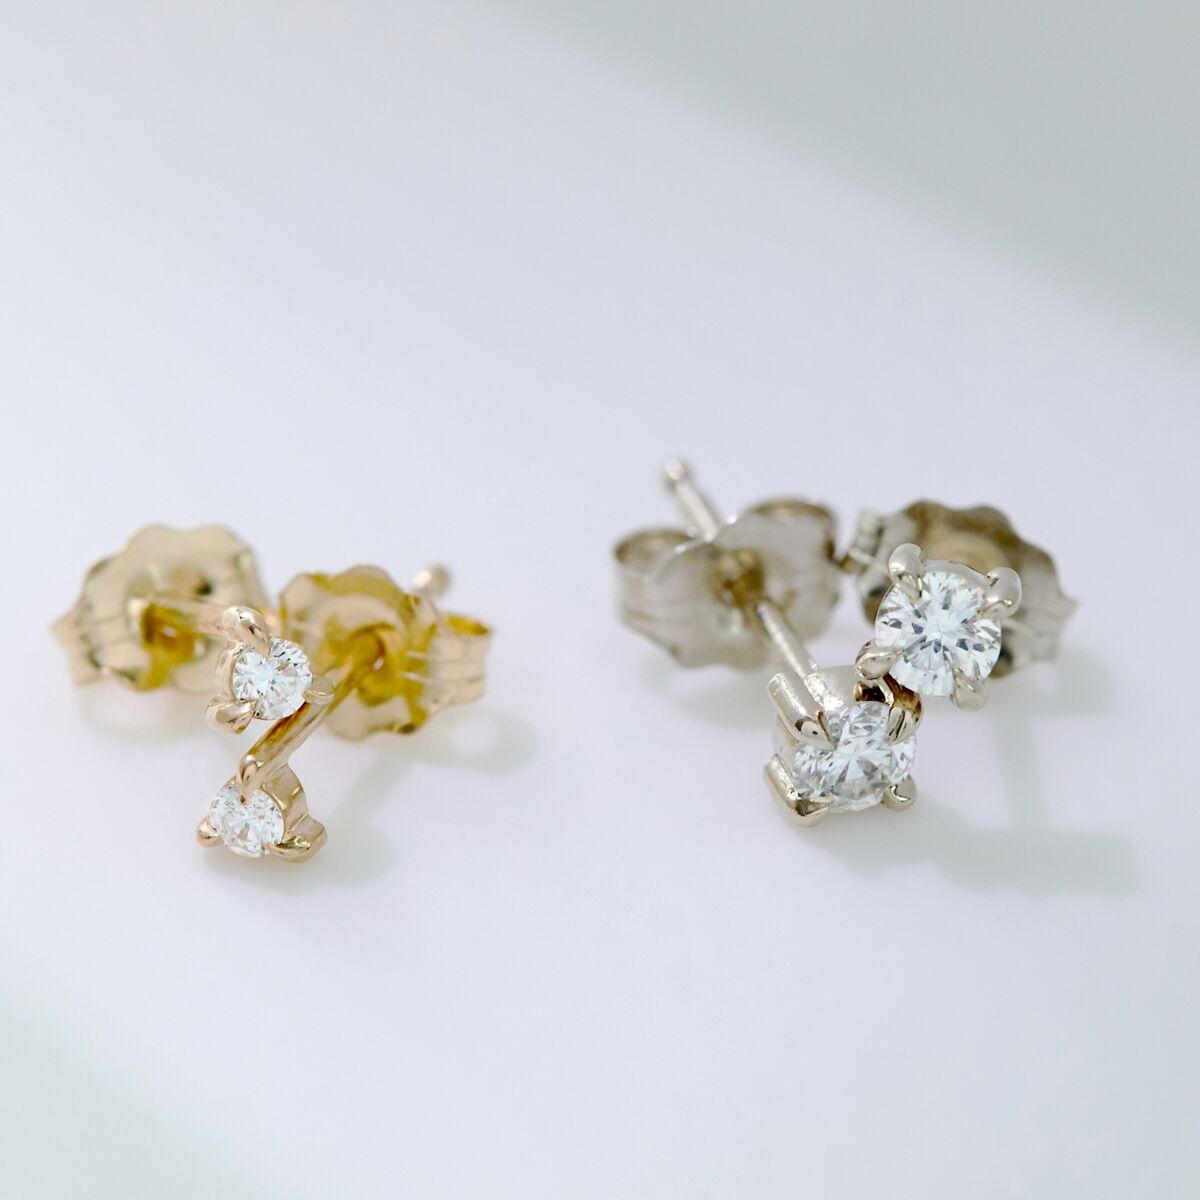 Angel Hair Diamond Stud, Sparkler, White Gold (single) image